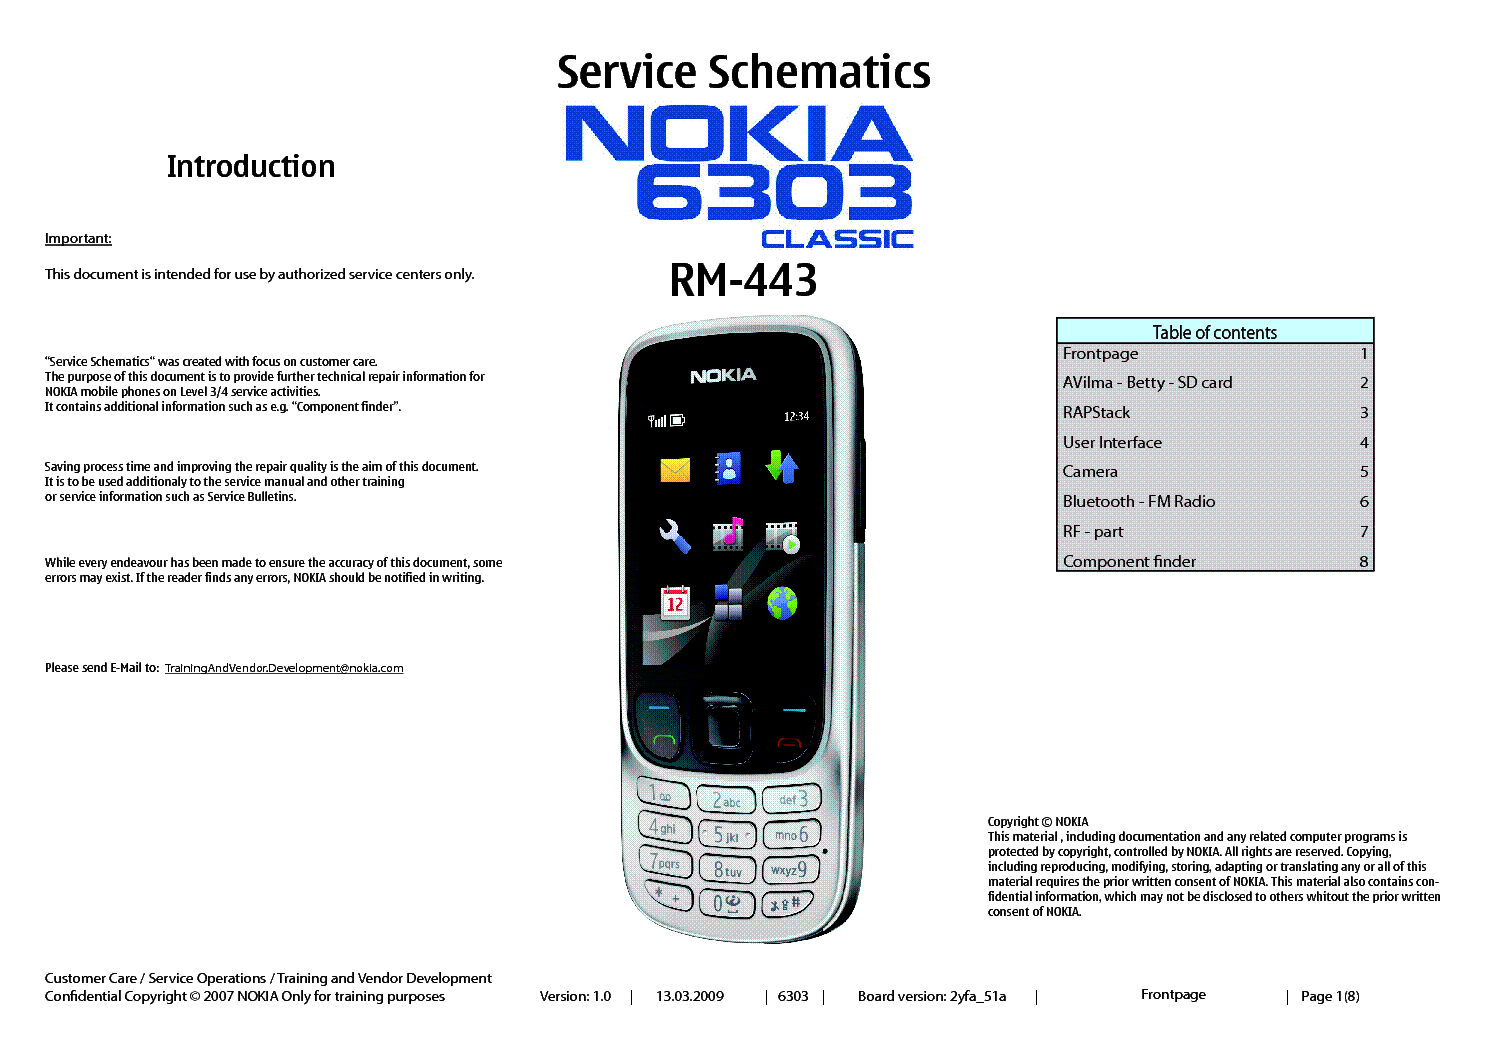 nokia 6303c service schematics v1 0 sch service manual download rh elektrotanya com Nokia N95 Nokia N85